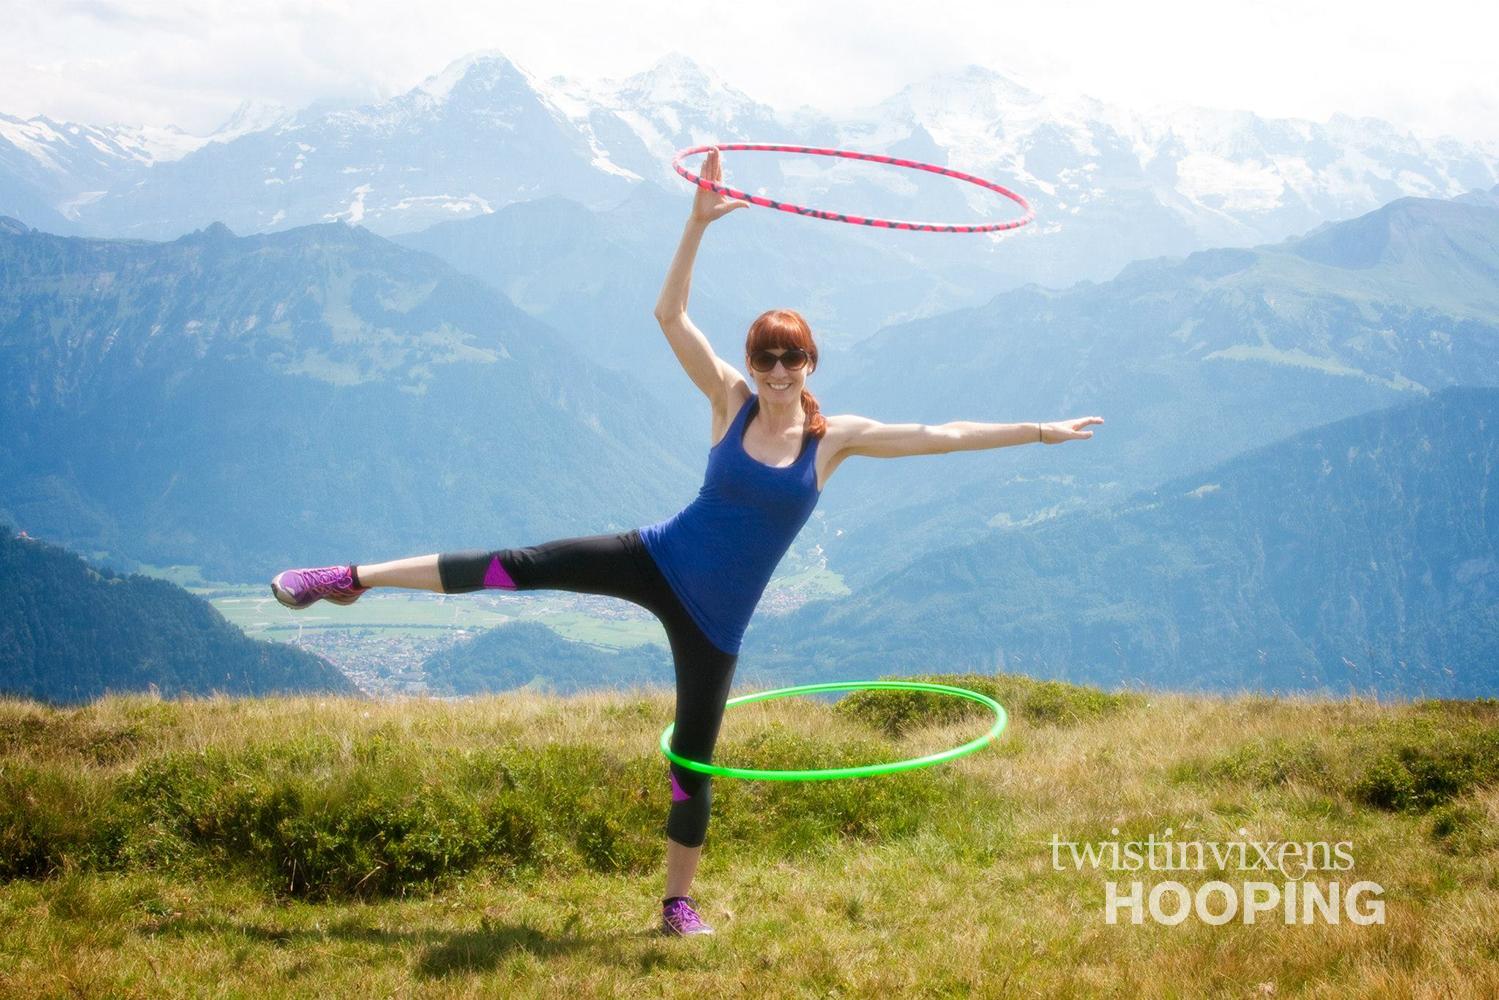 Hoop Dancing in the Summertime